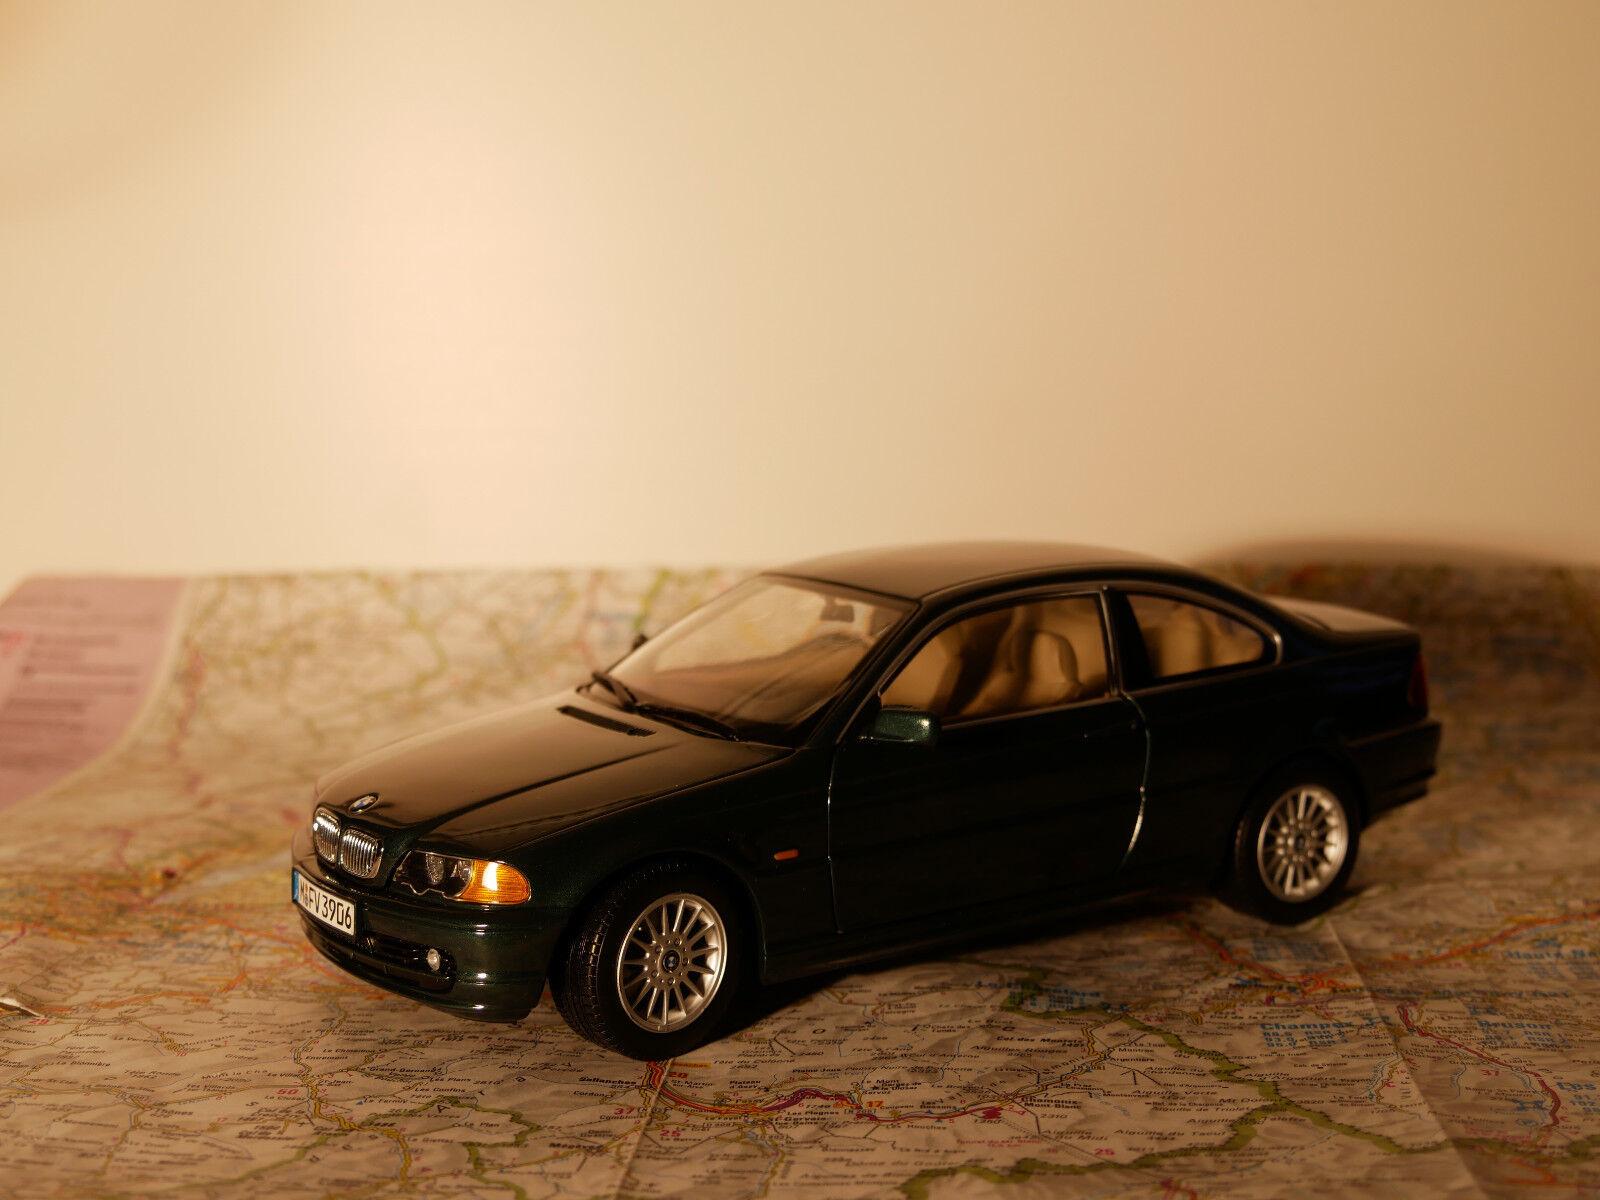 KYOSHO BMW 328Ci verde  ART.80439411466 BWM - DEALER- VERSION + BOX  1 18  NEW